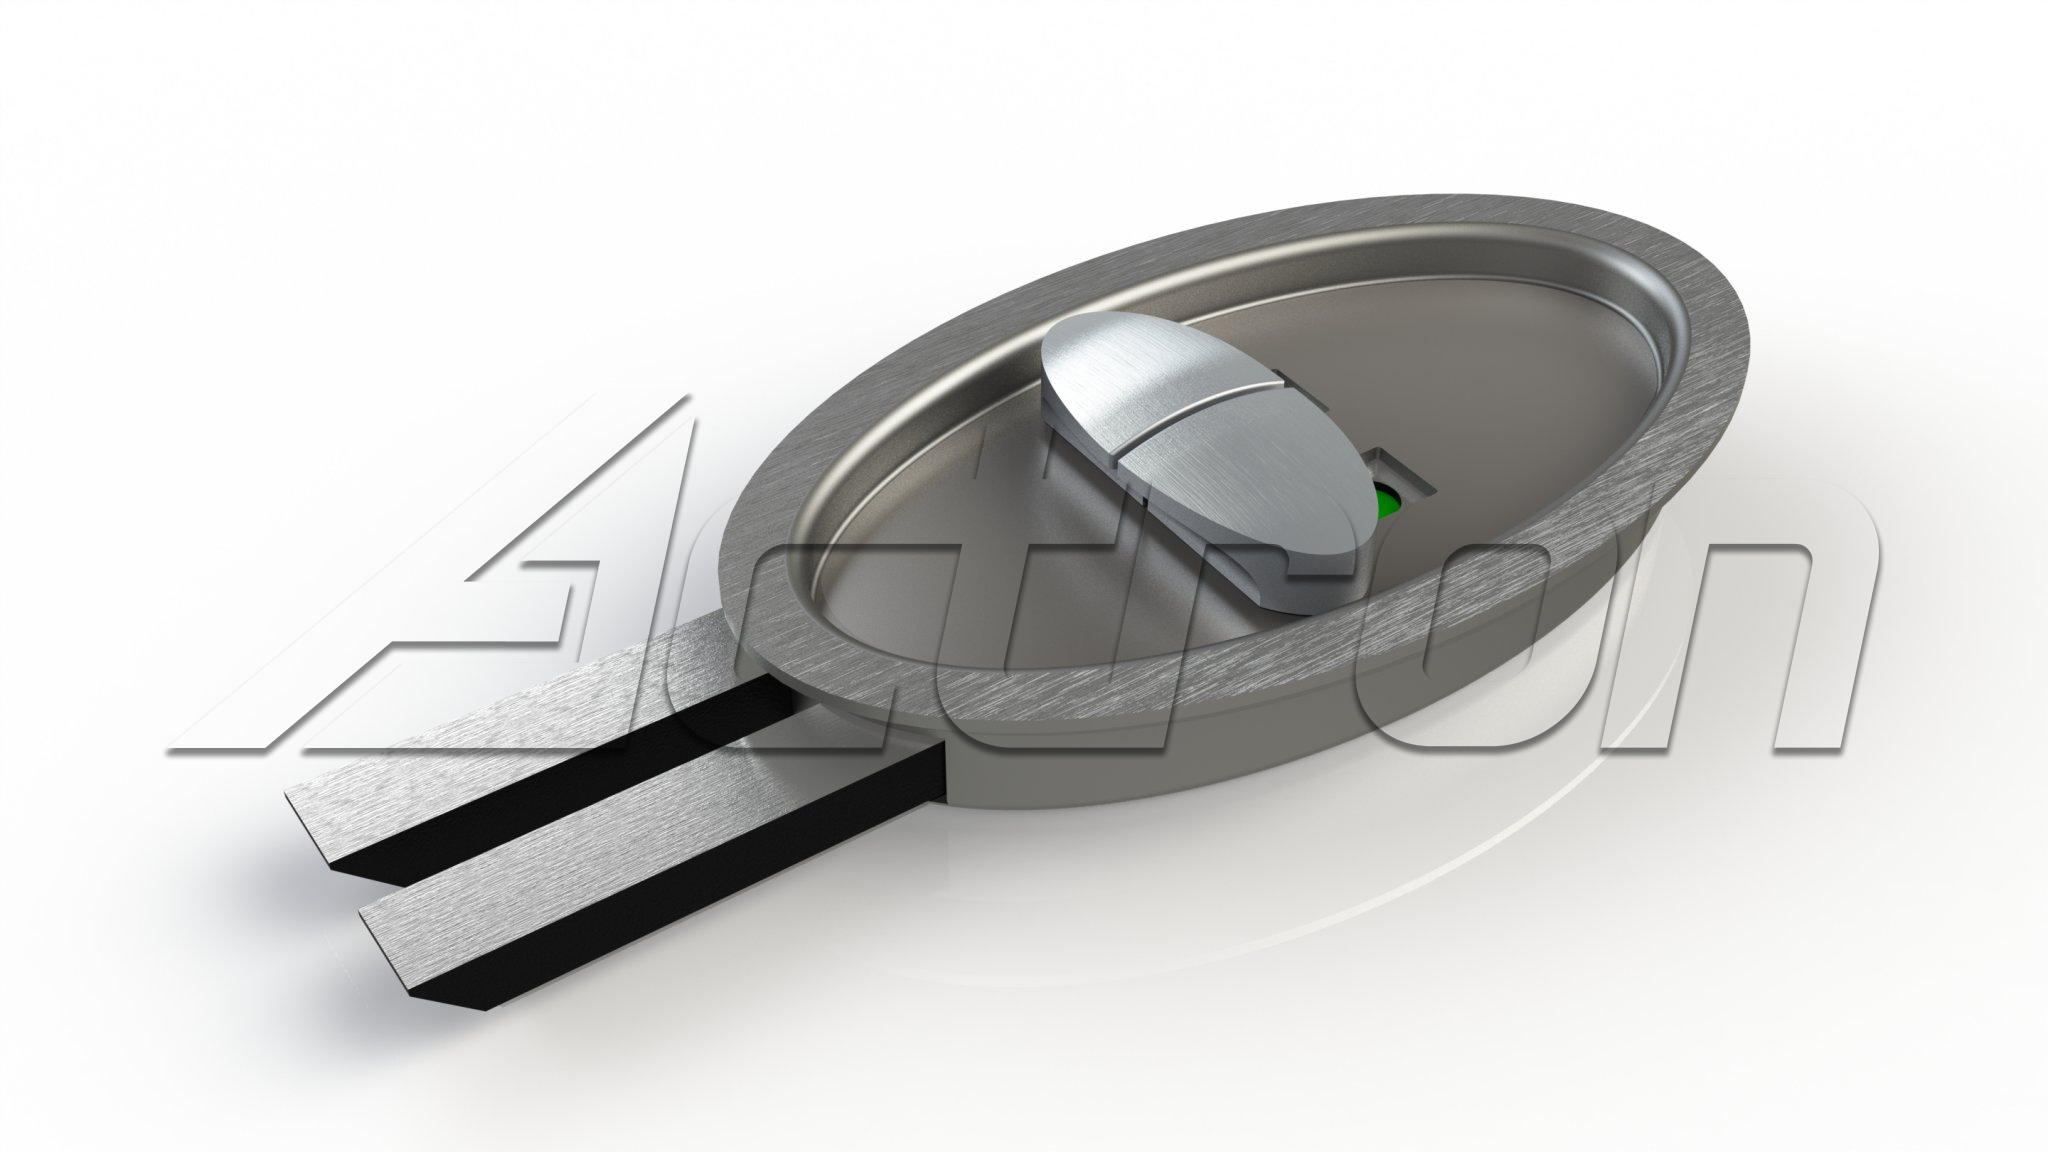 latch-assy-8211-sliding-5317-a27335.jpg